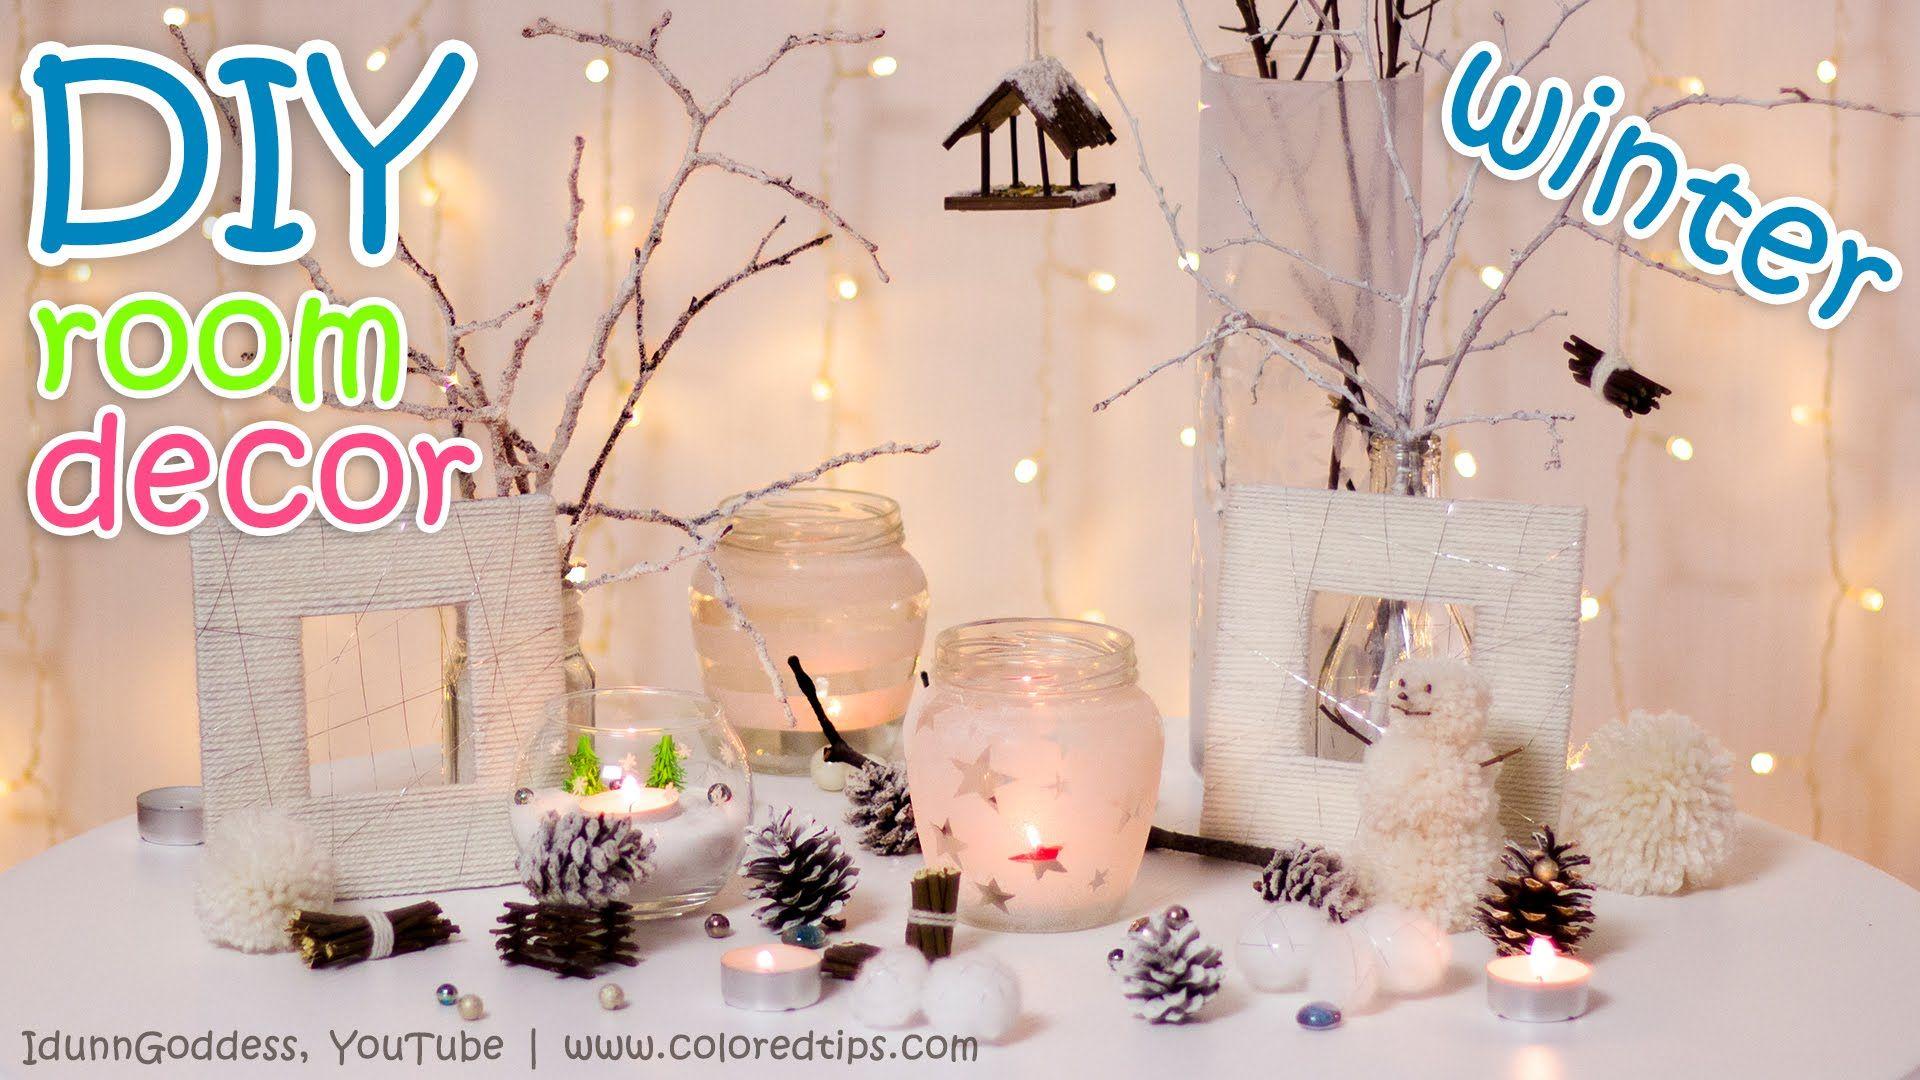 10 Diy Winter Room Decor Ideas Christmas Room Decor Diy Winter Decorations Diy Winter Diy